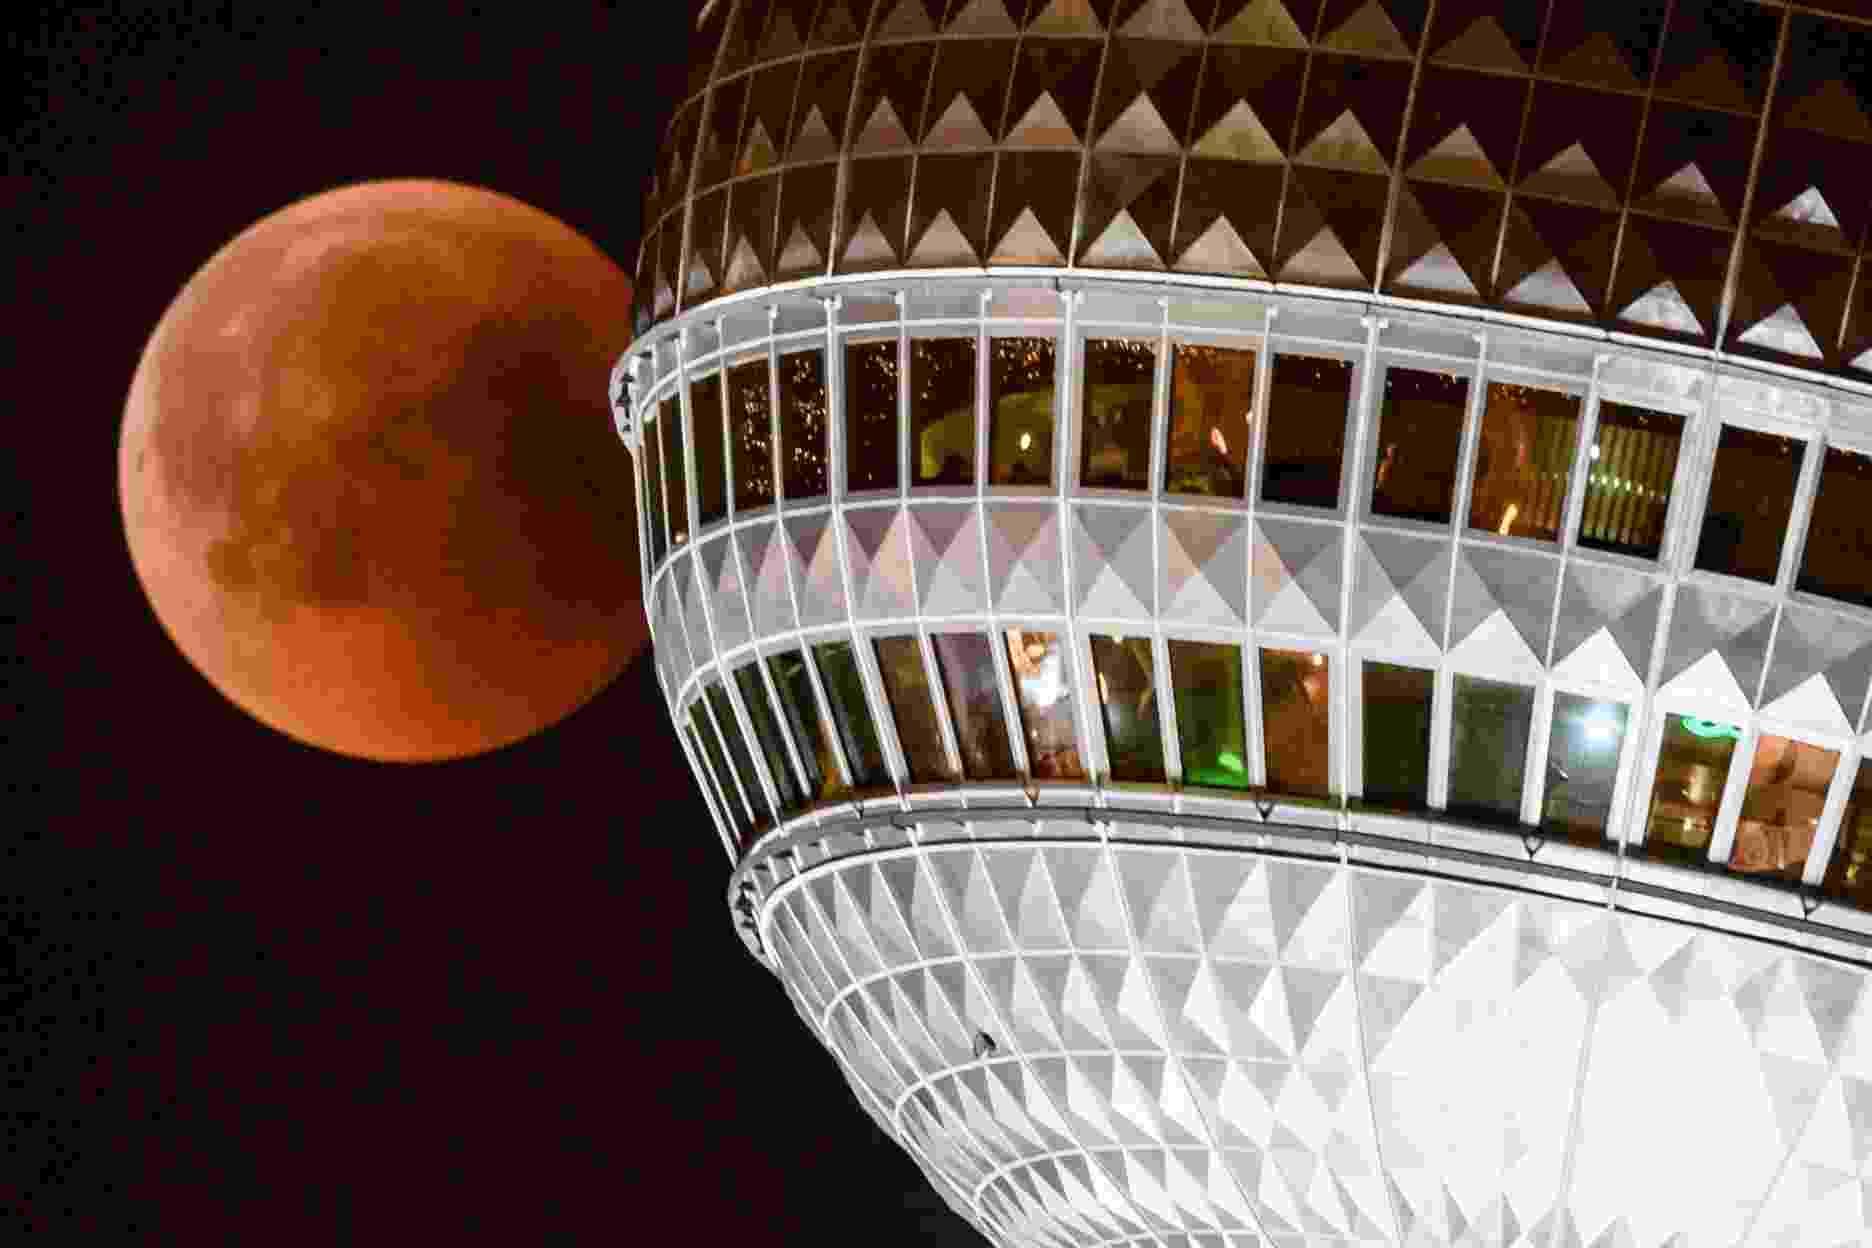 27.jul.18 - Lua de sangue vista com a torre de TV de Berlim, na Alemanha - EFE/EPA/CLEMENS BILAN